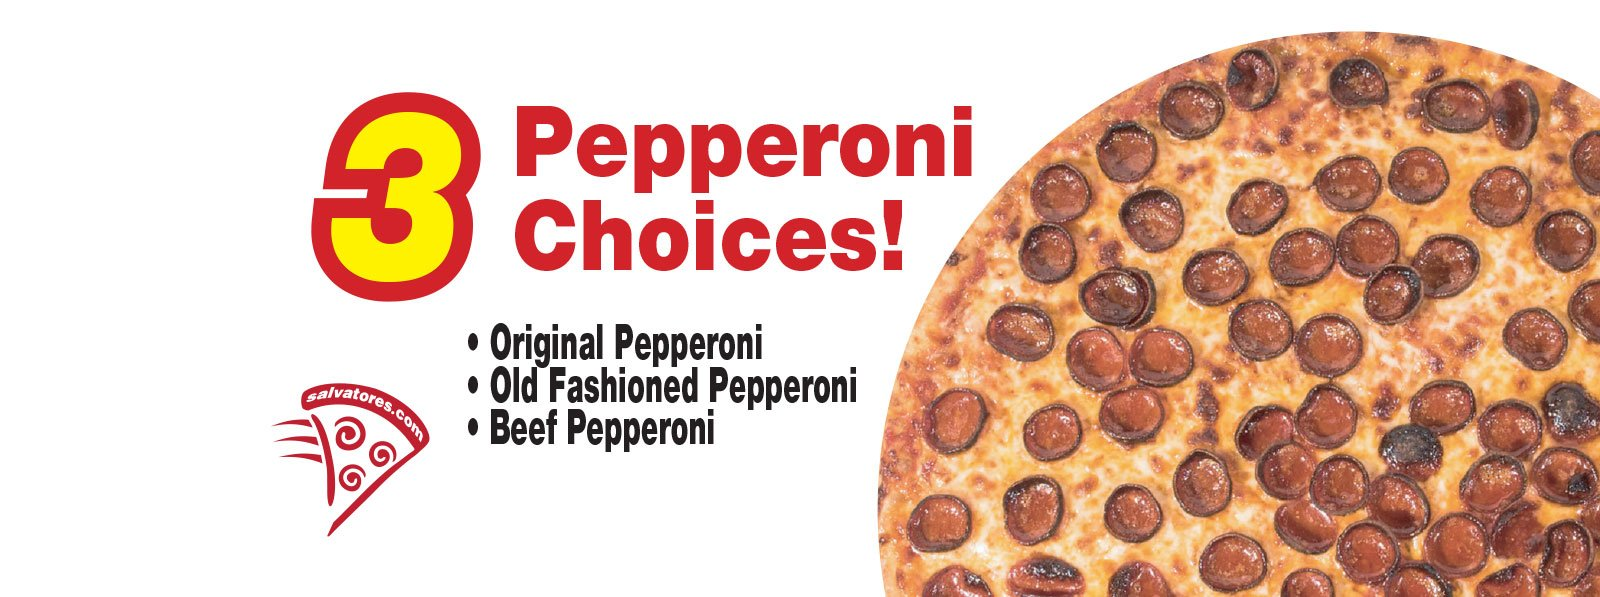 Salvatore's Old Fashioned Pizzeria image 3